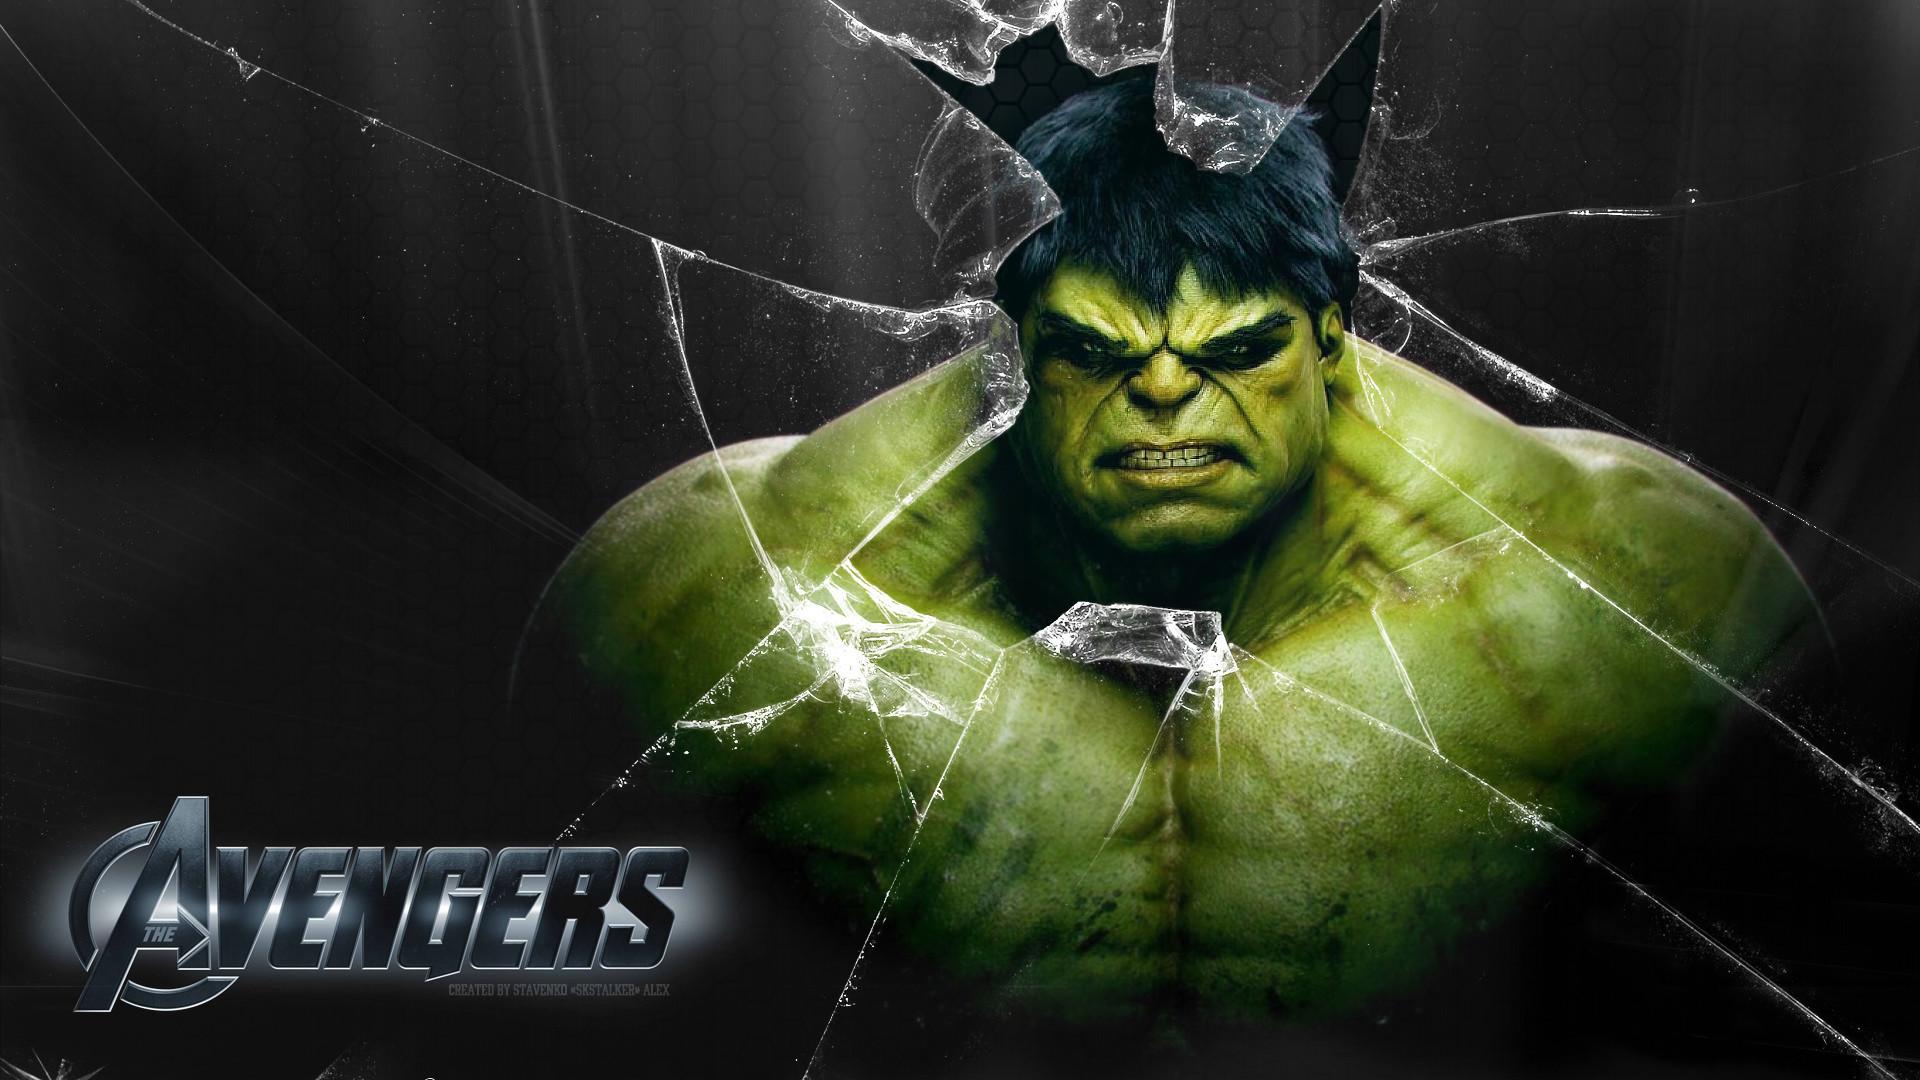 avengers hulk wallpaper 1080p by skstalker fan art wallpaper movies tv .